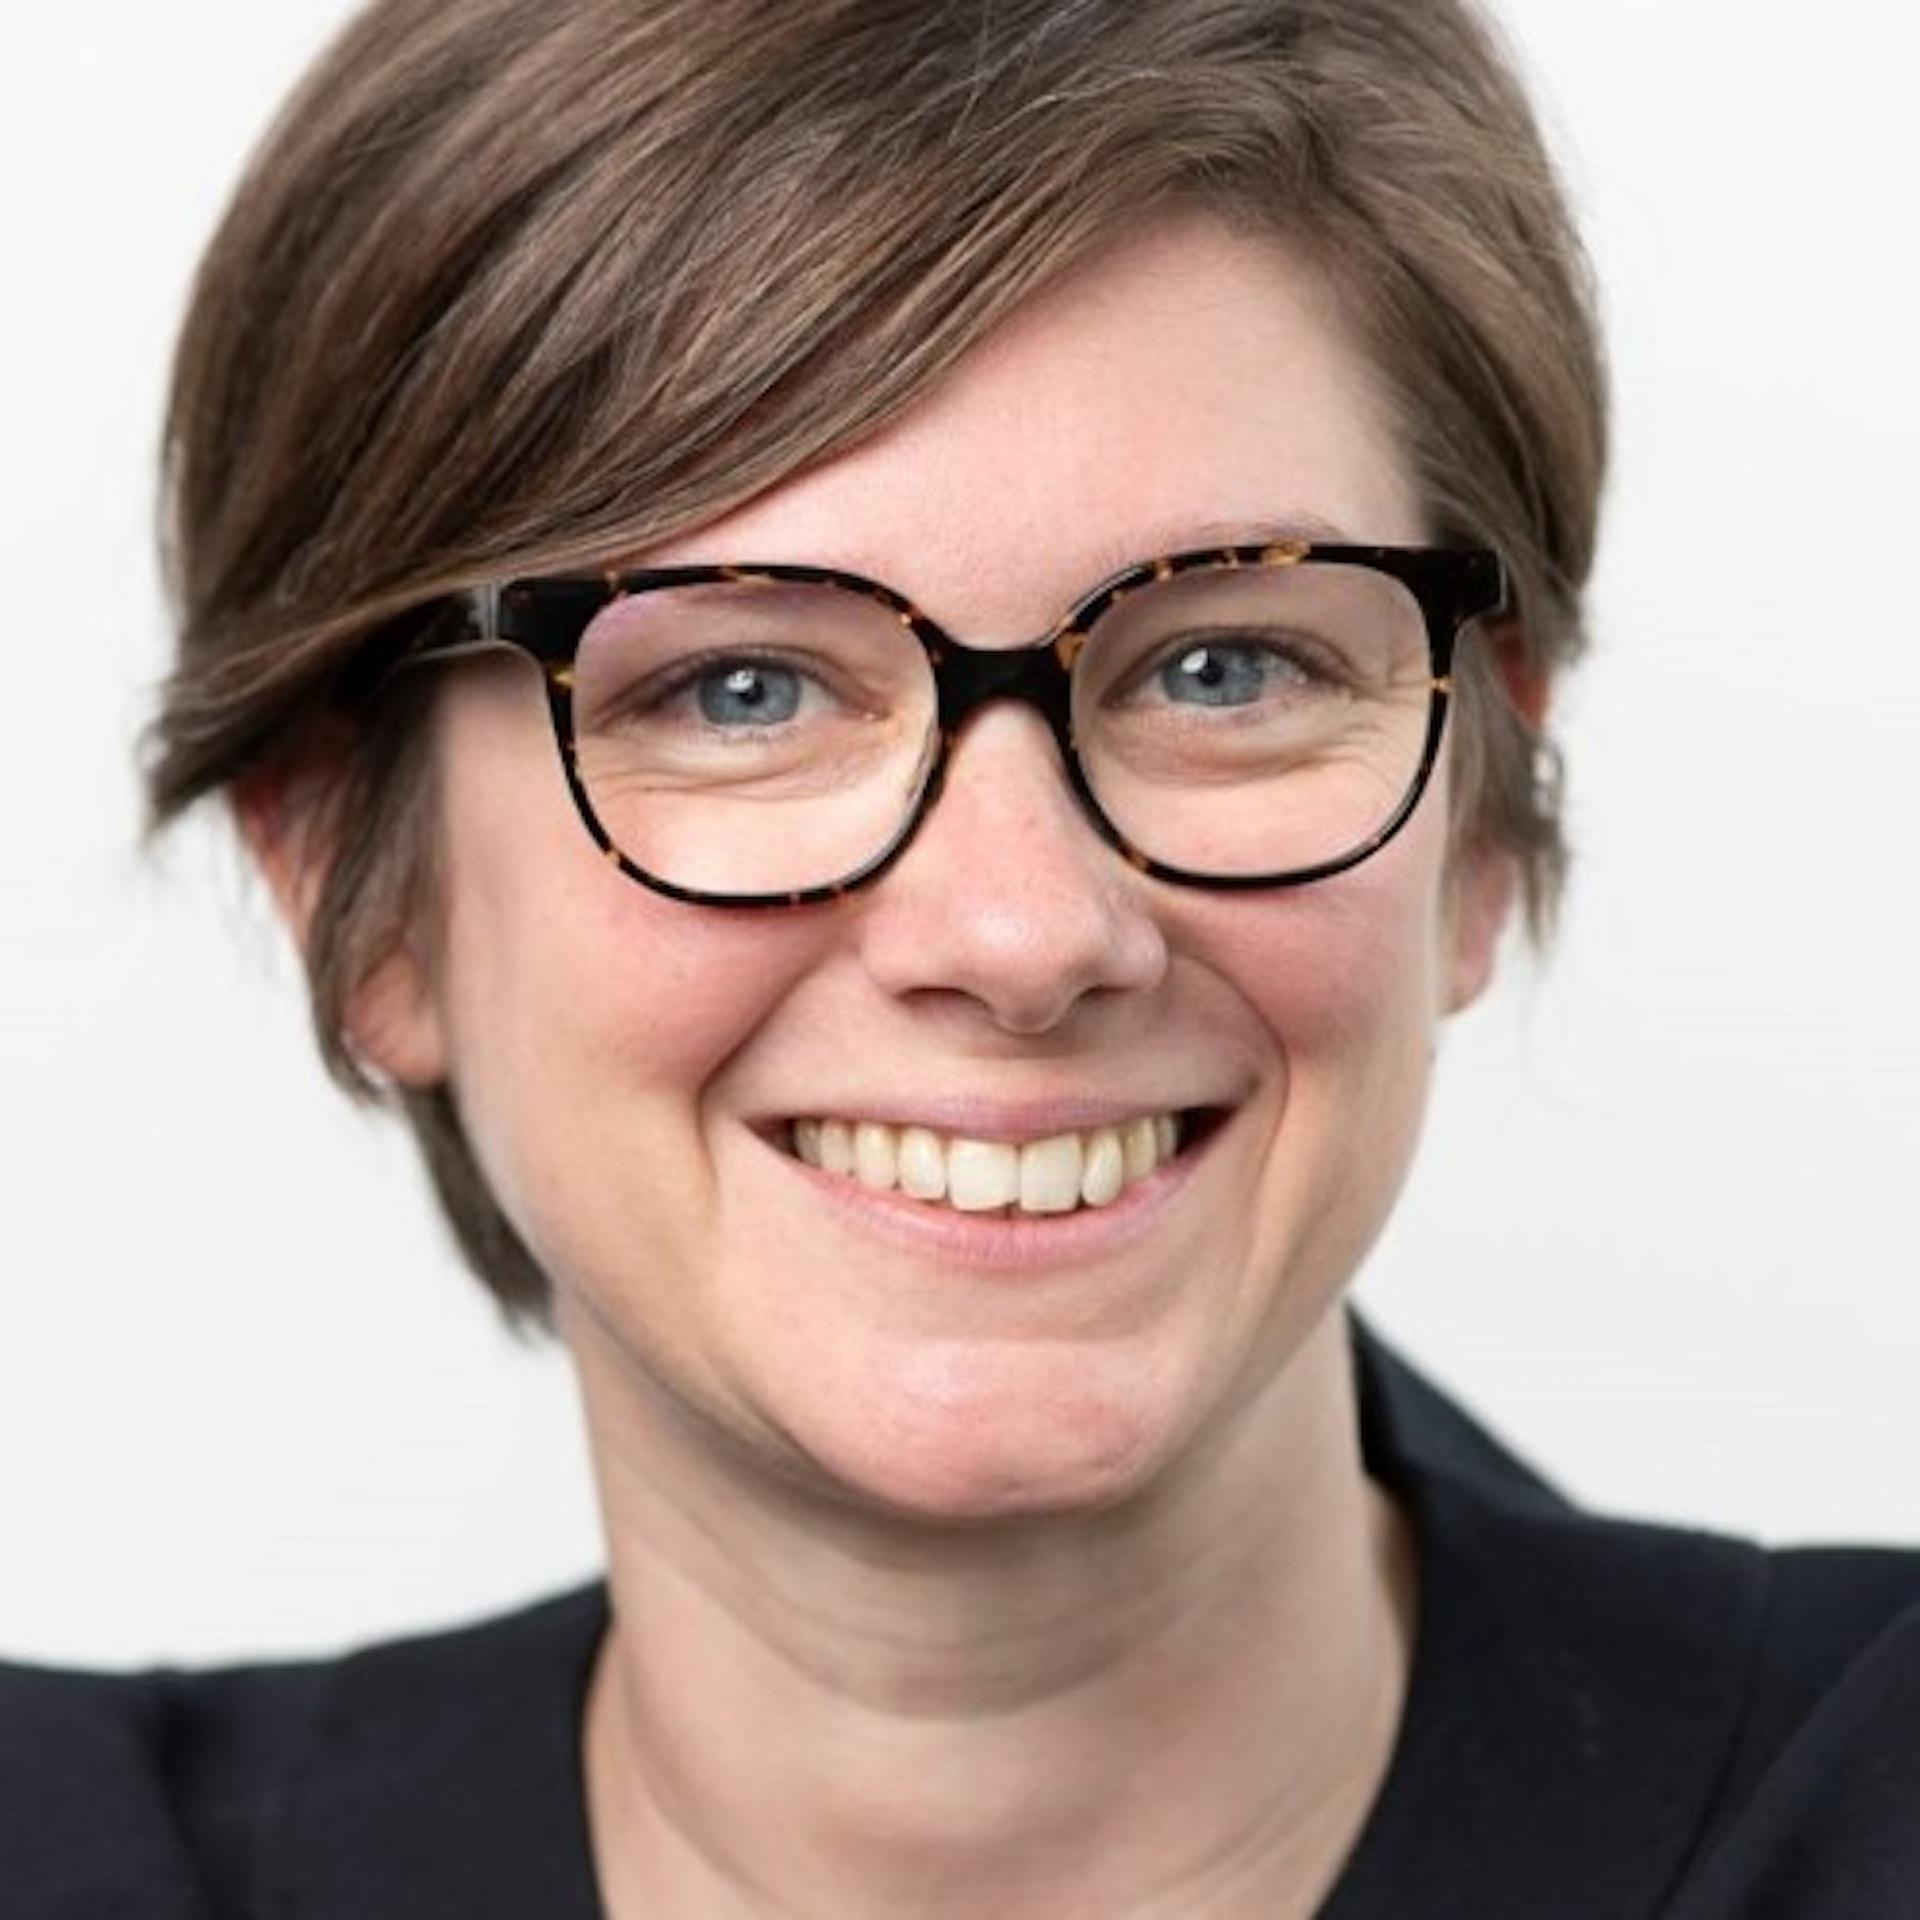 Claire Brossard